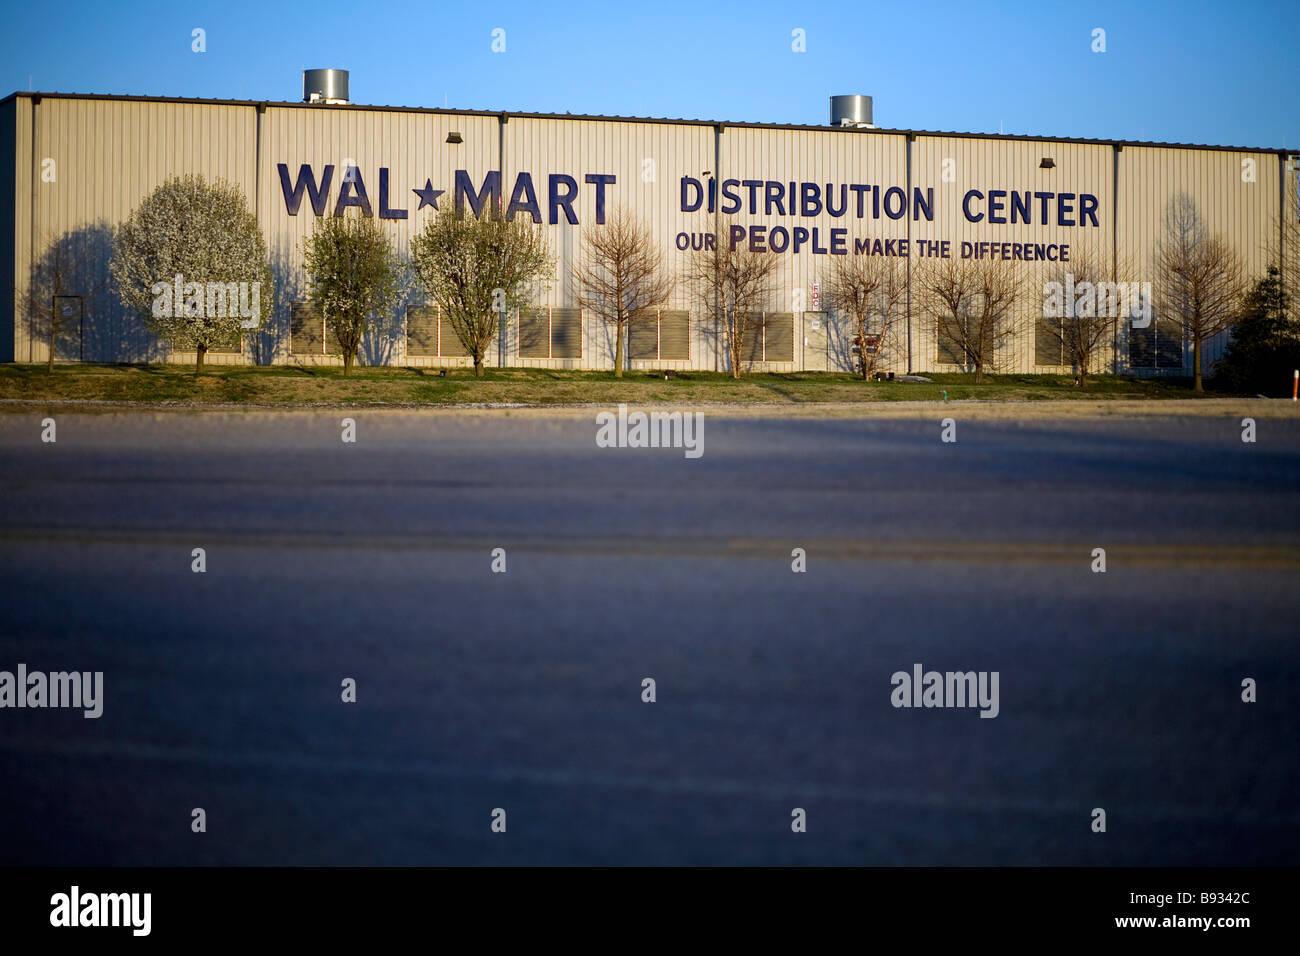 Walmart Distribution Center No. 6094 in Bentonville, Arkansas, U.S.A. - Stock Image